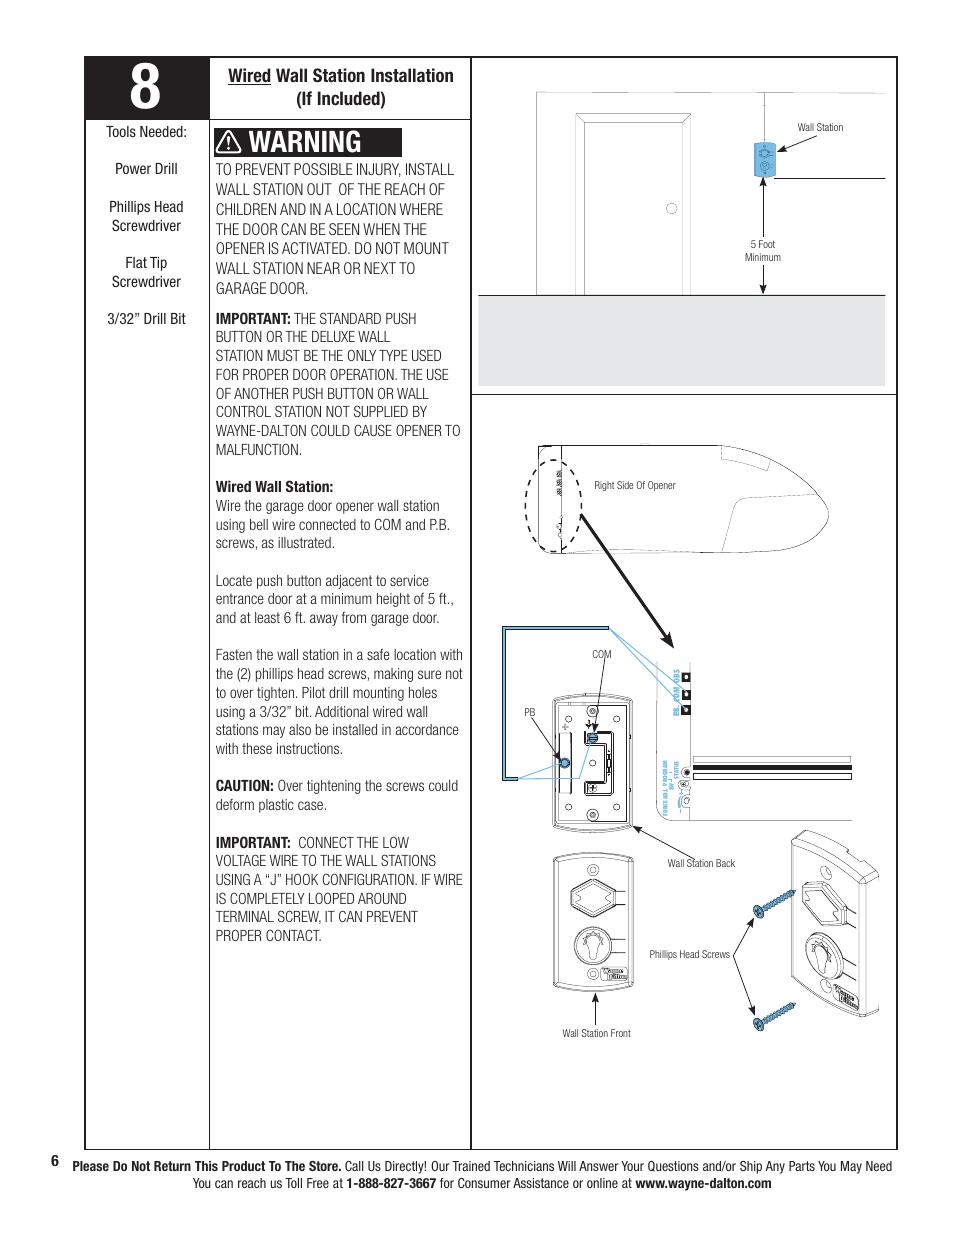 medium resolution of wiring diagram for wall mount garage door wiring diagram datasource warning wired wall station installation